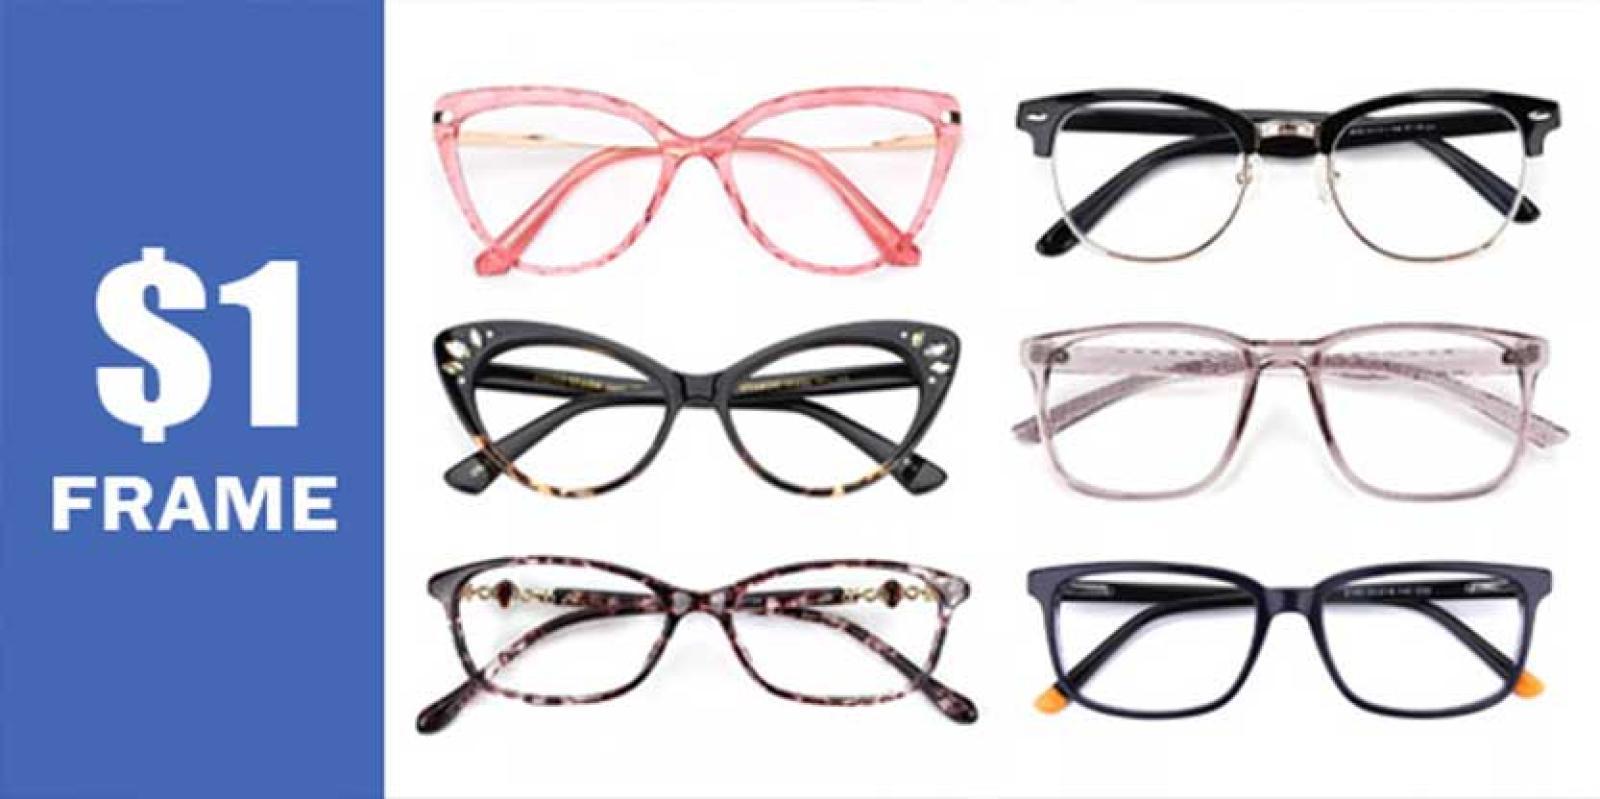 1.67 Digital Free Form Progressive UV+ Blue Blocker-Translucent---Eyeglasses-additional3